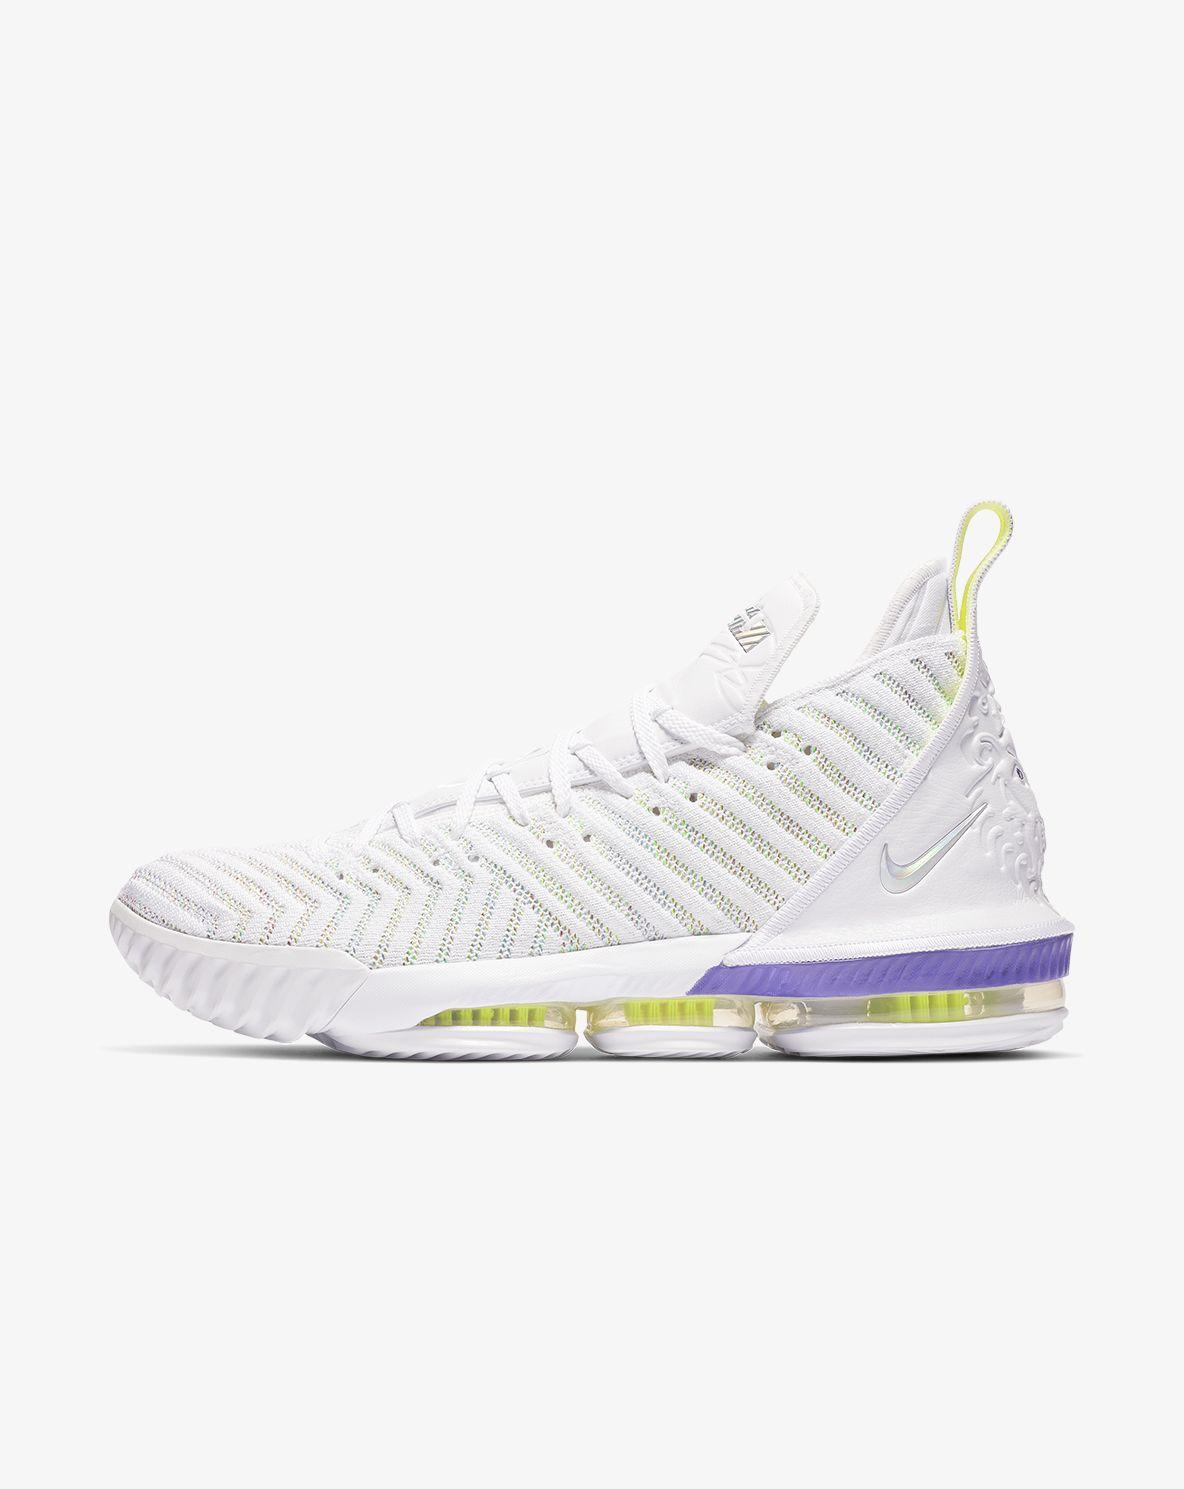 Nike Basketball. TH